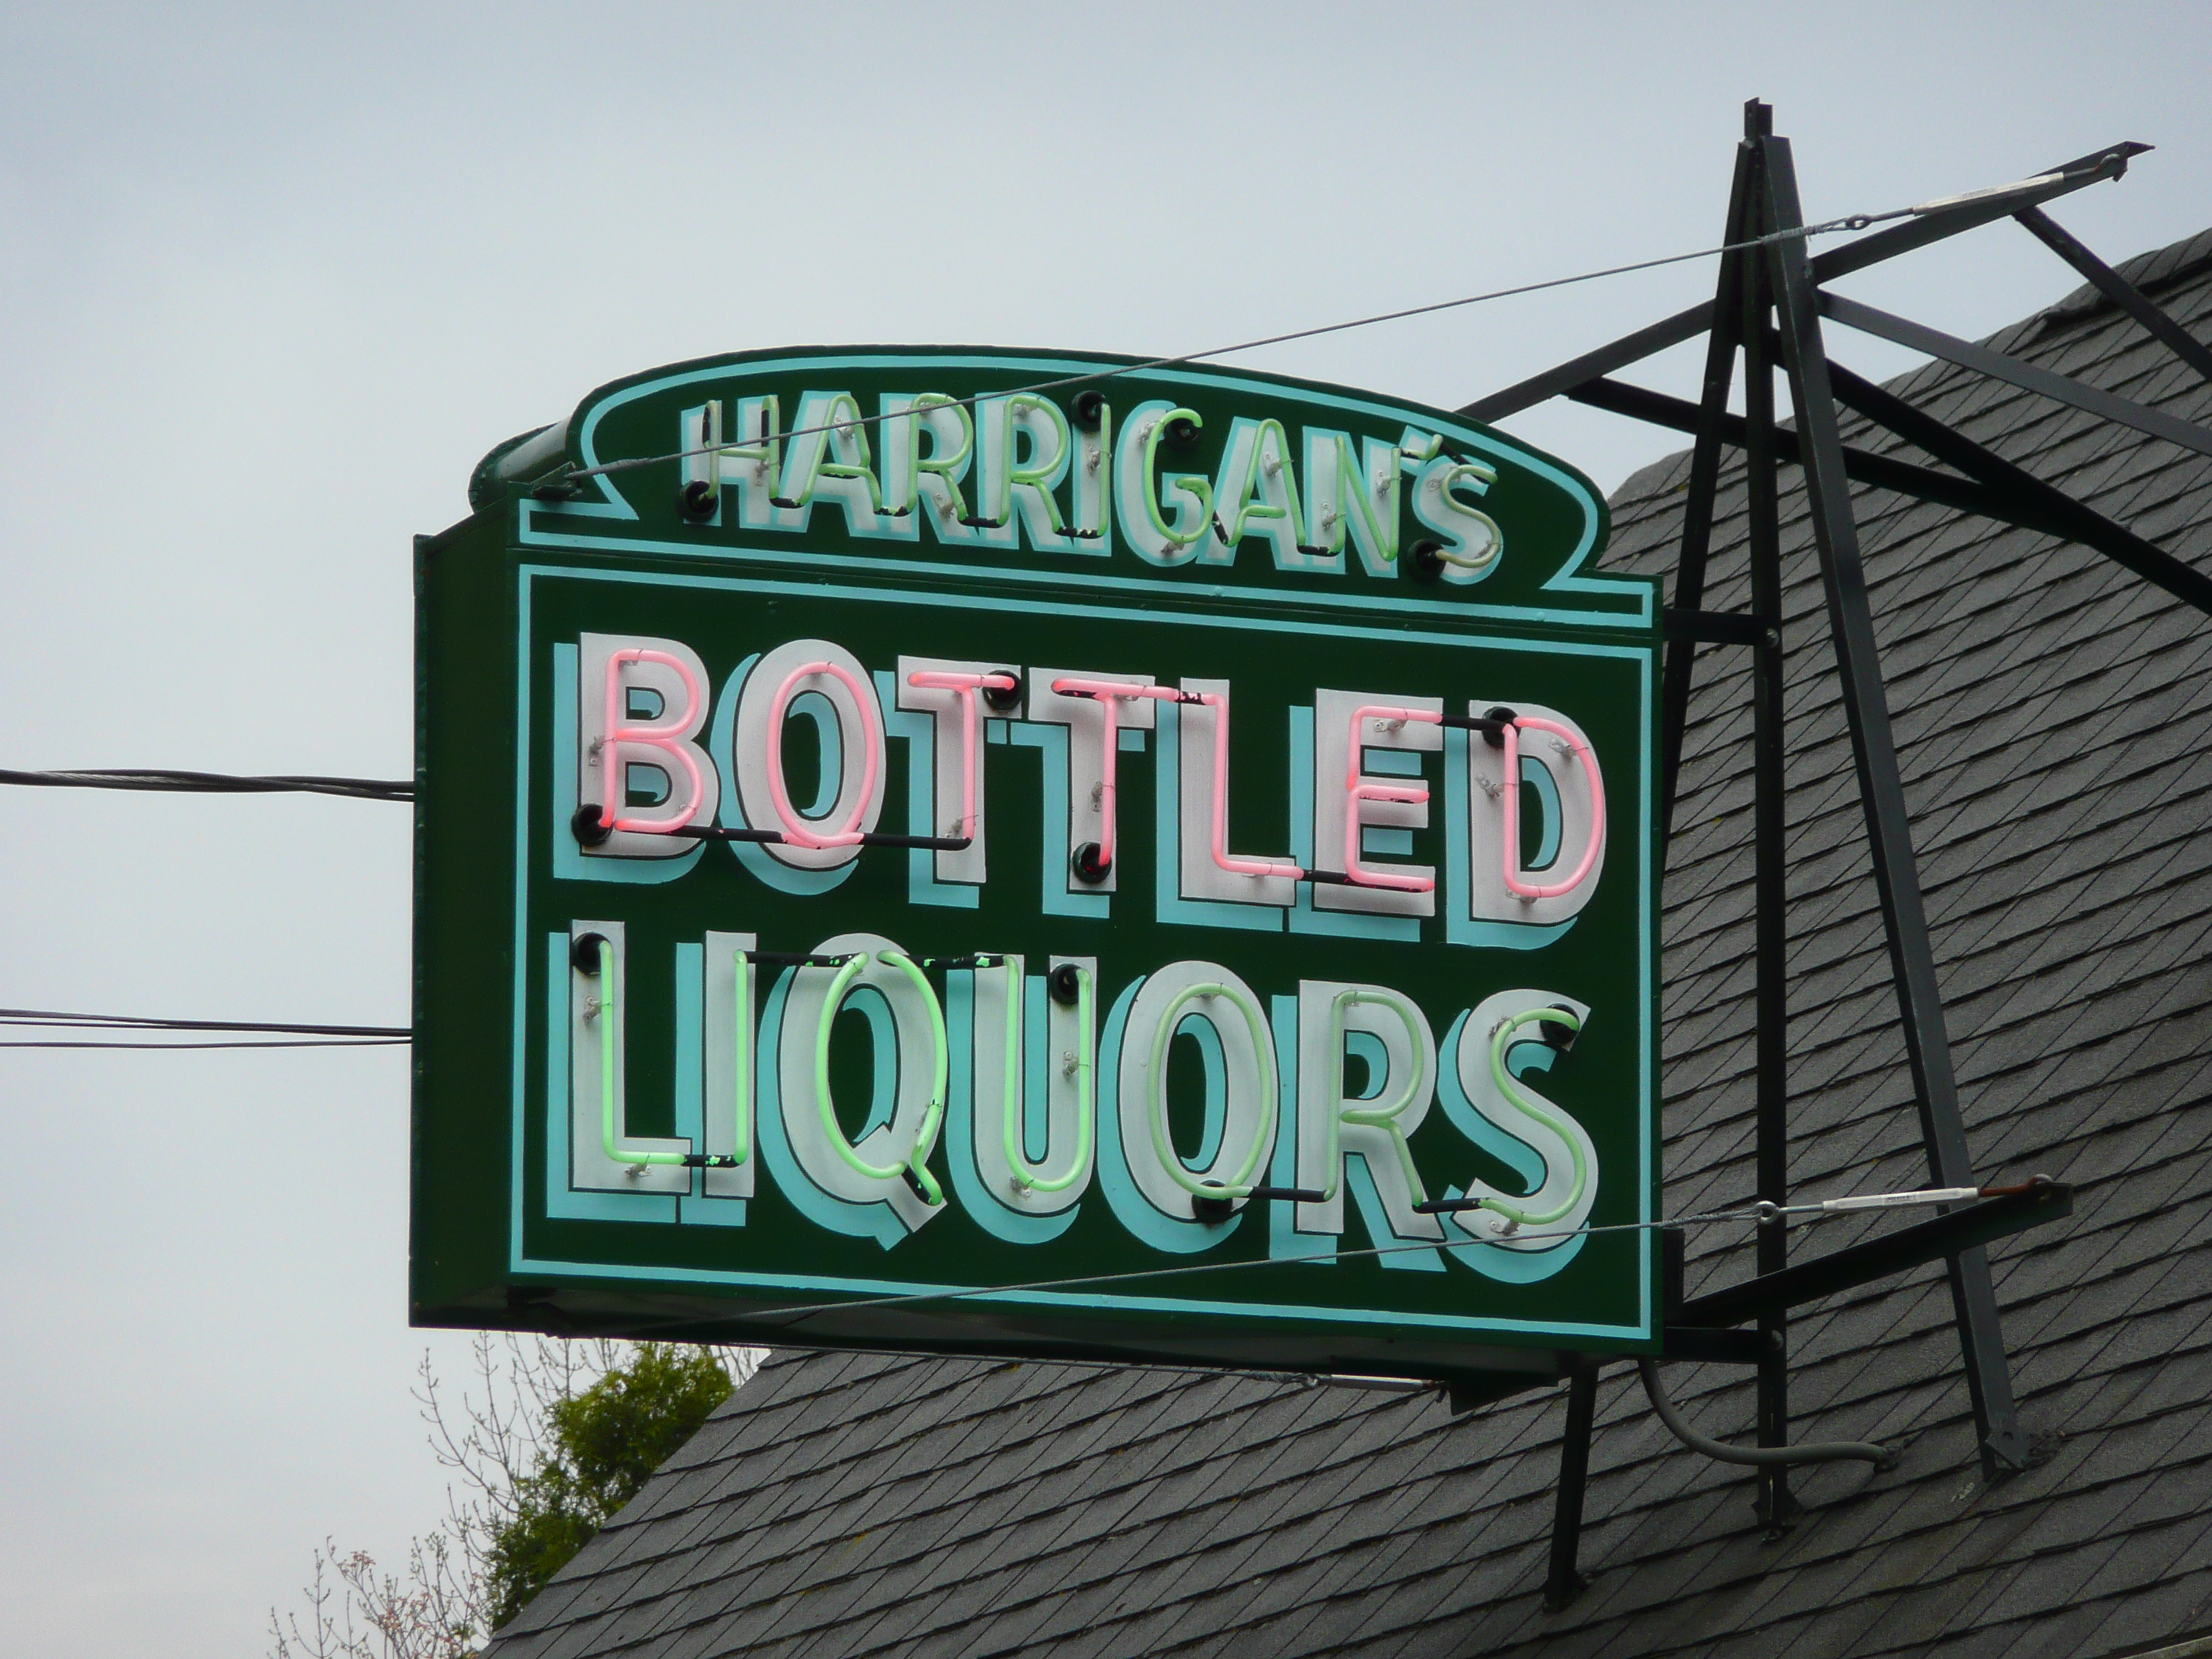 Harrigan's Bottled Liquors - 505 Bay Road, South Hamilton, Massachusetts U.S.A. - May 4, 2009